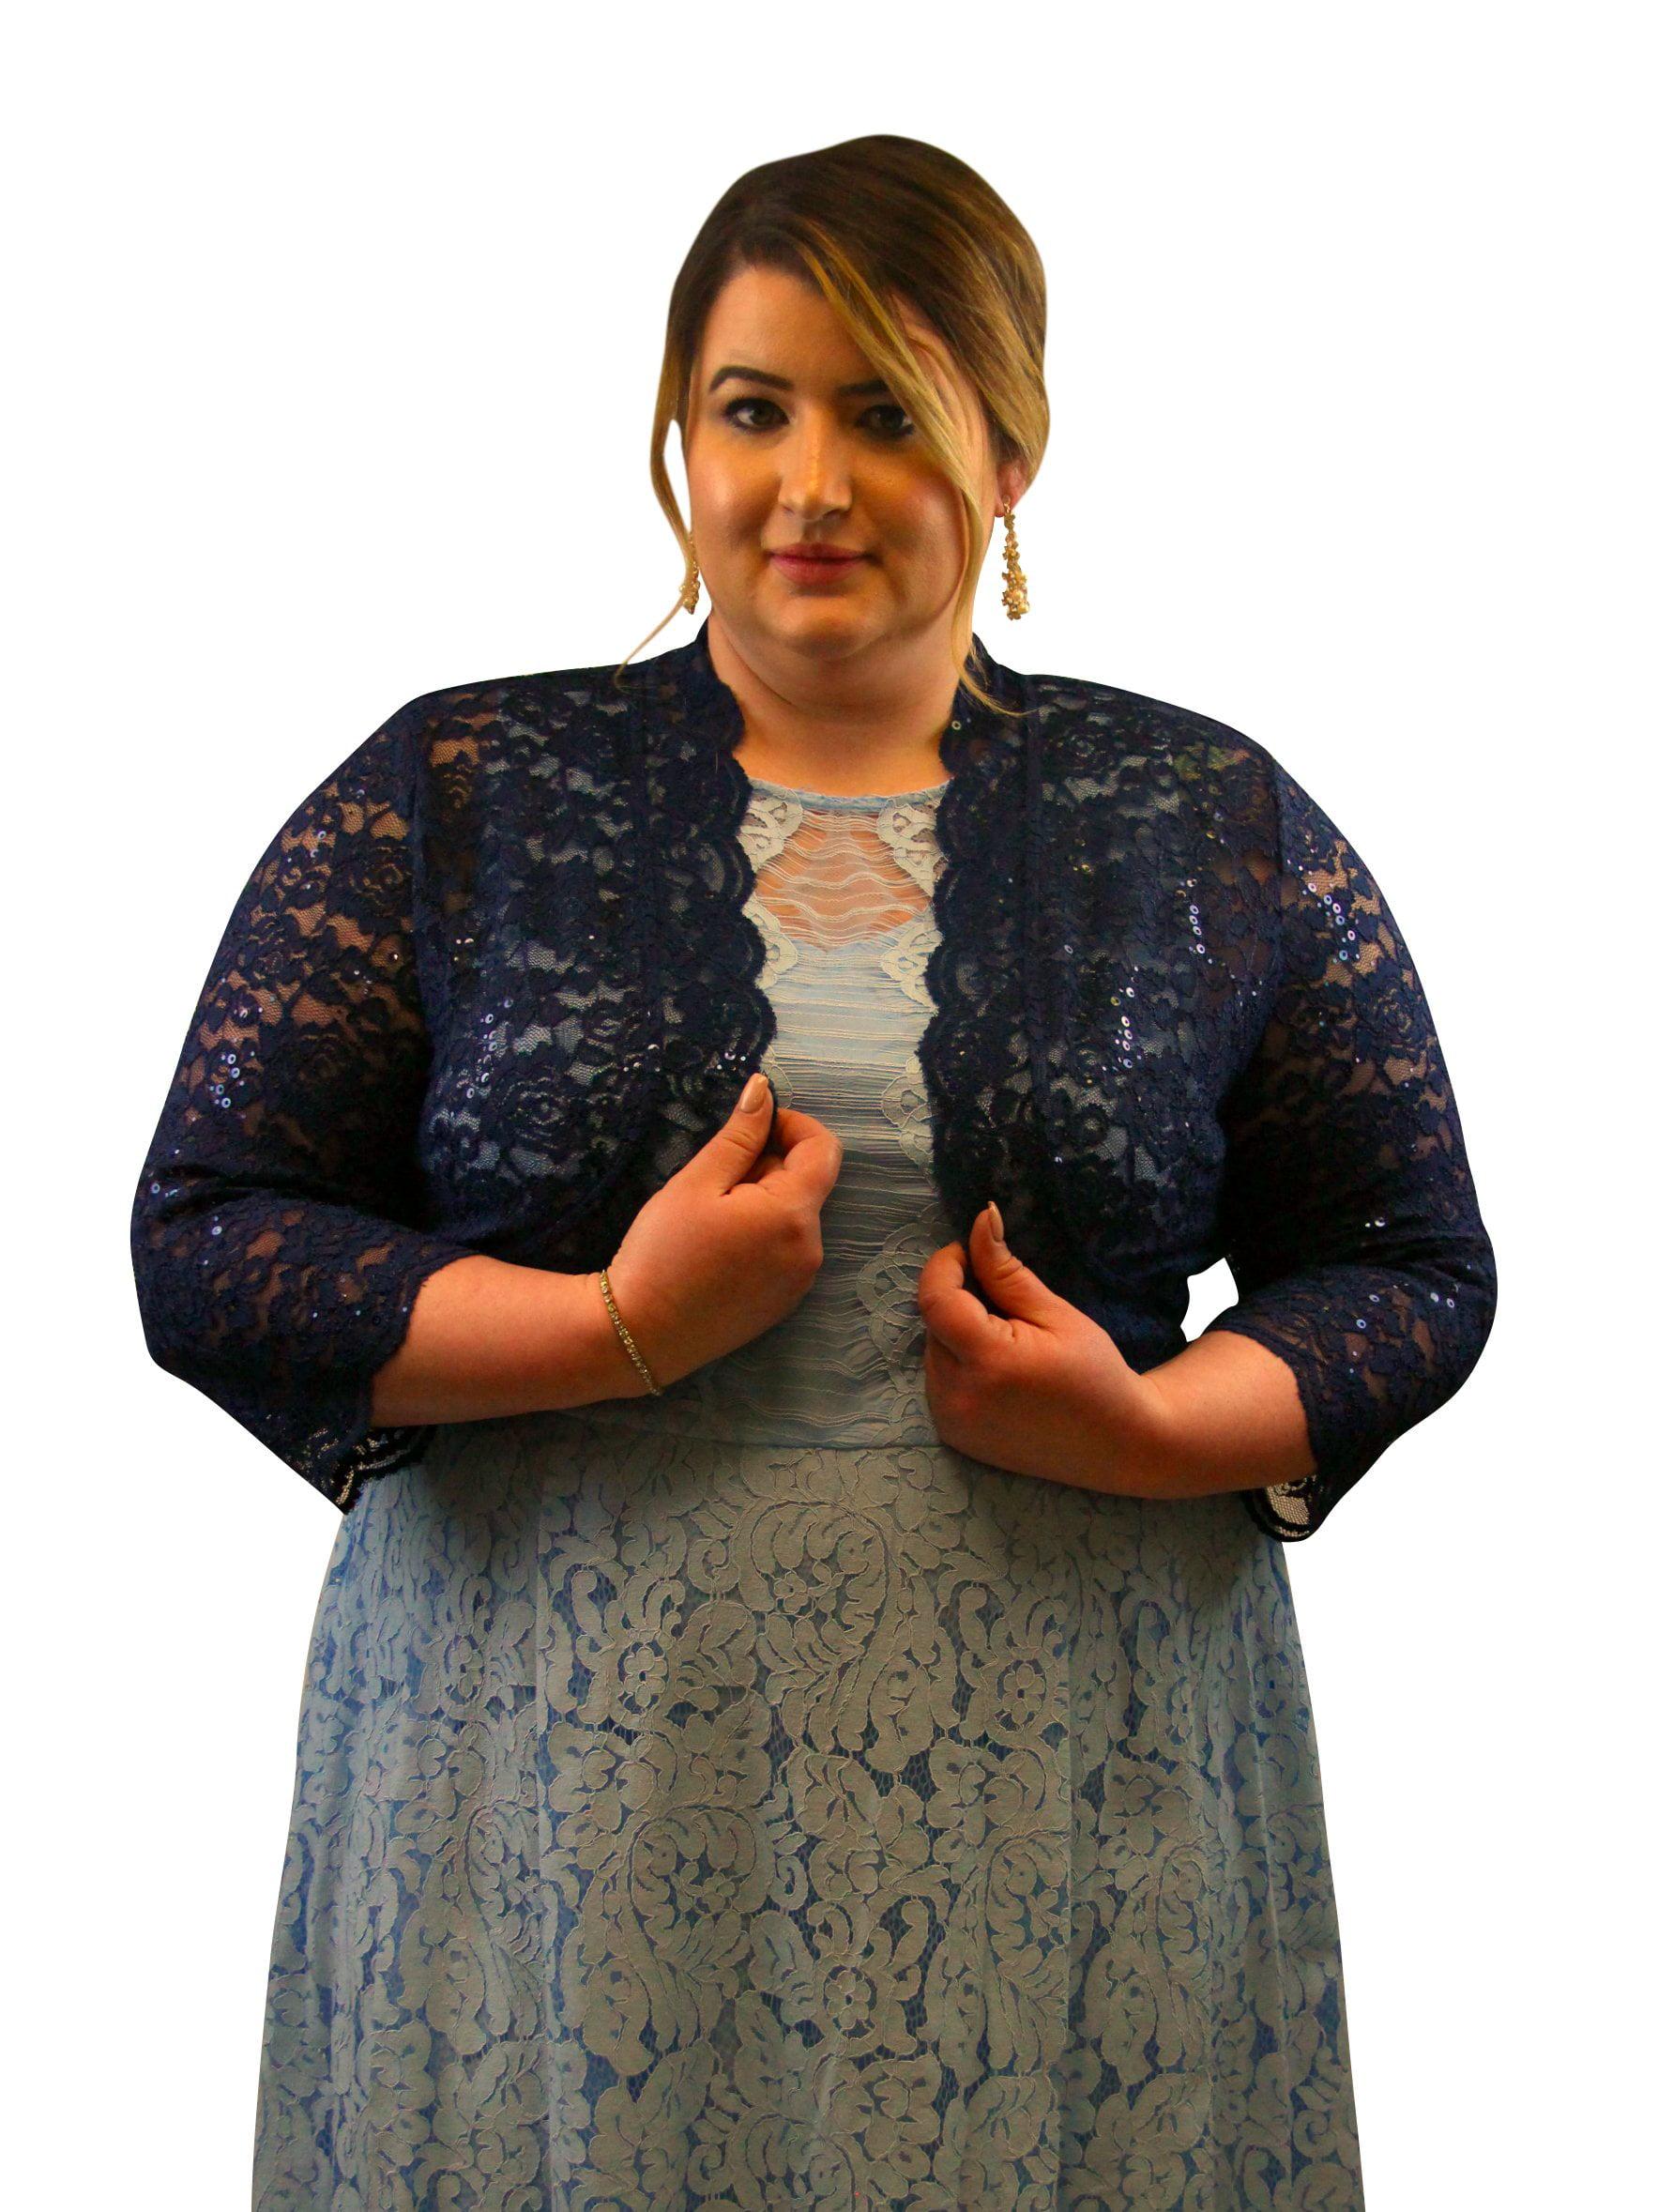 SleekTrends Plus Size Women Elbow Sleeve Sequin Lace Bolero Jacket - Dressy  Shrug